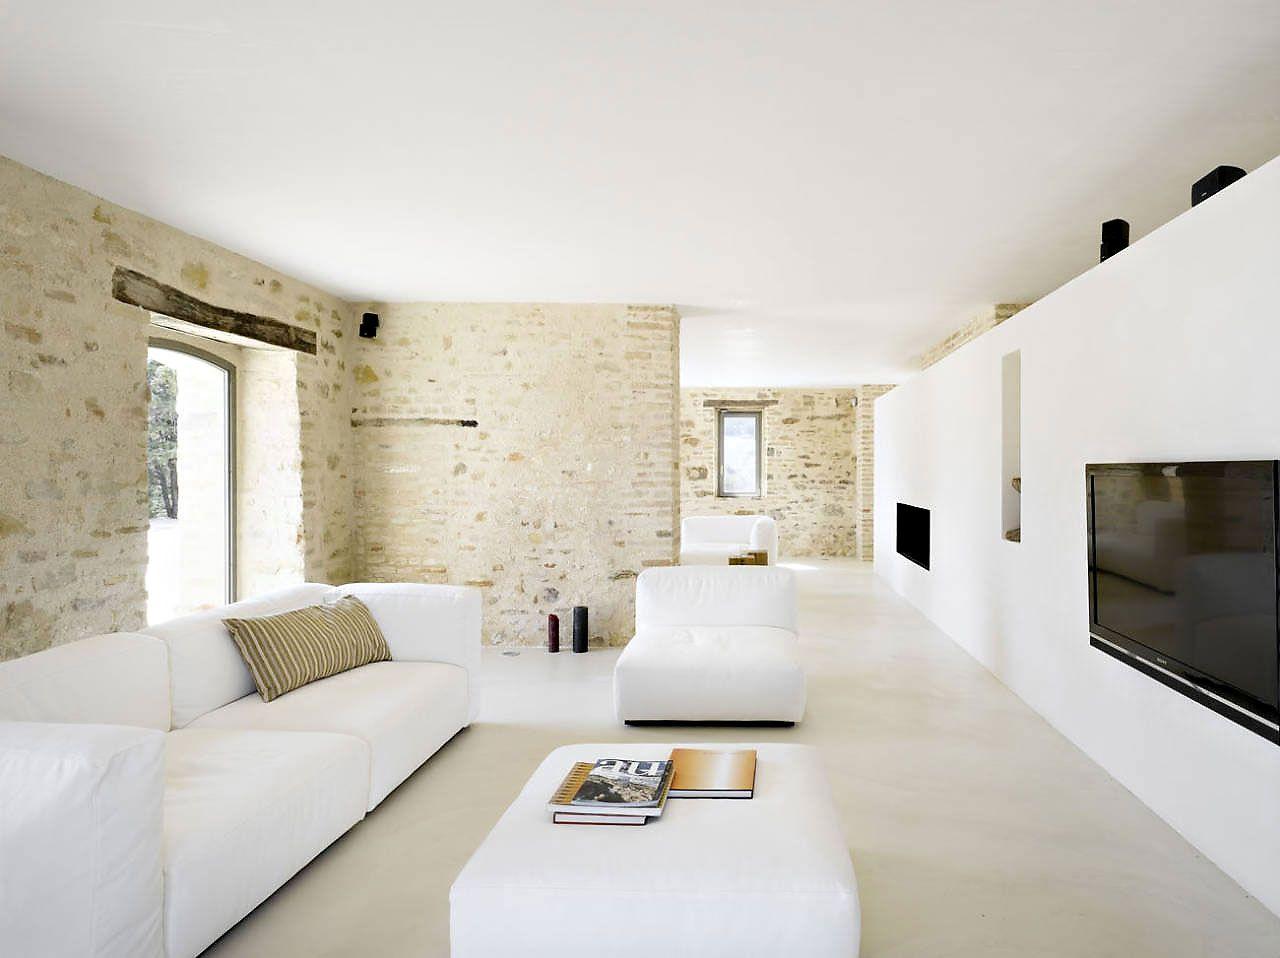 Stupendous Minimalism Interior Design Style Largest Home Design Picture Inspirations Pitcheantrous